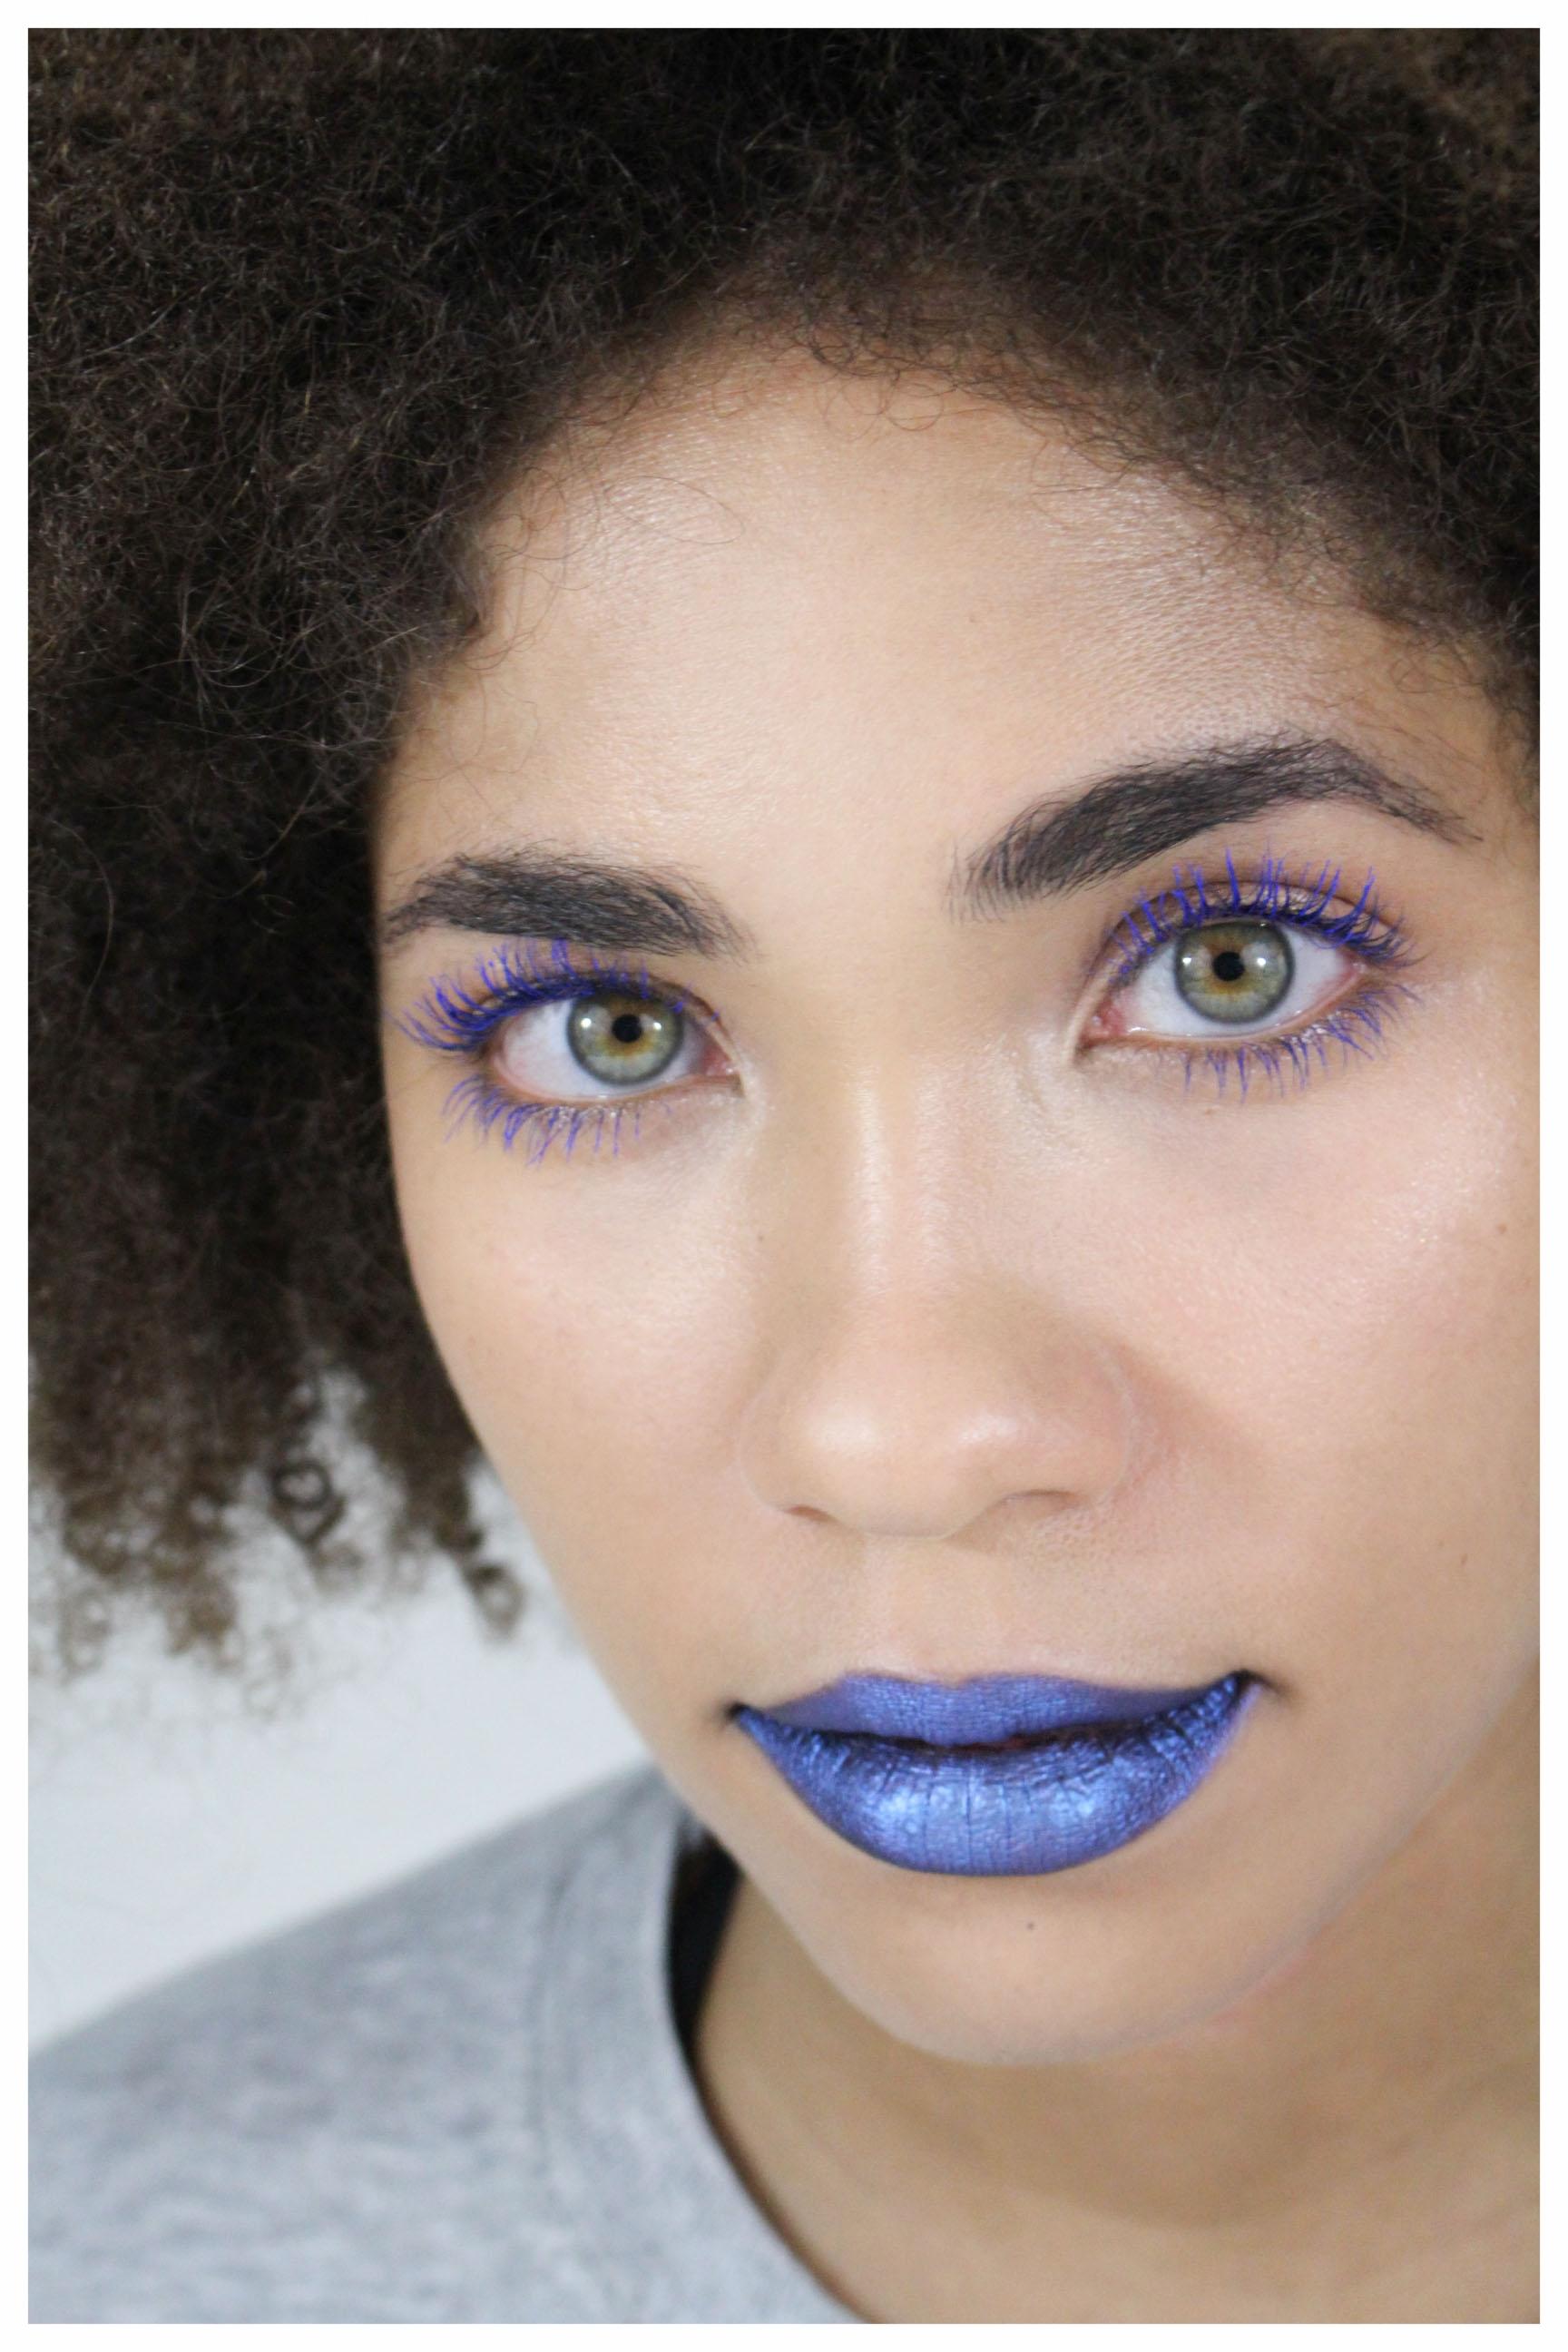 bluemascara3.jpg